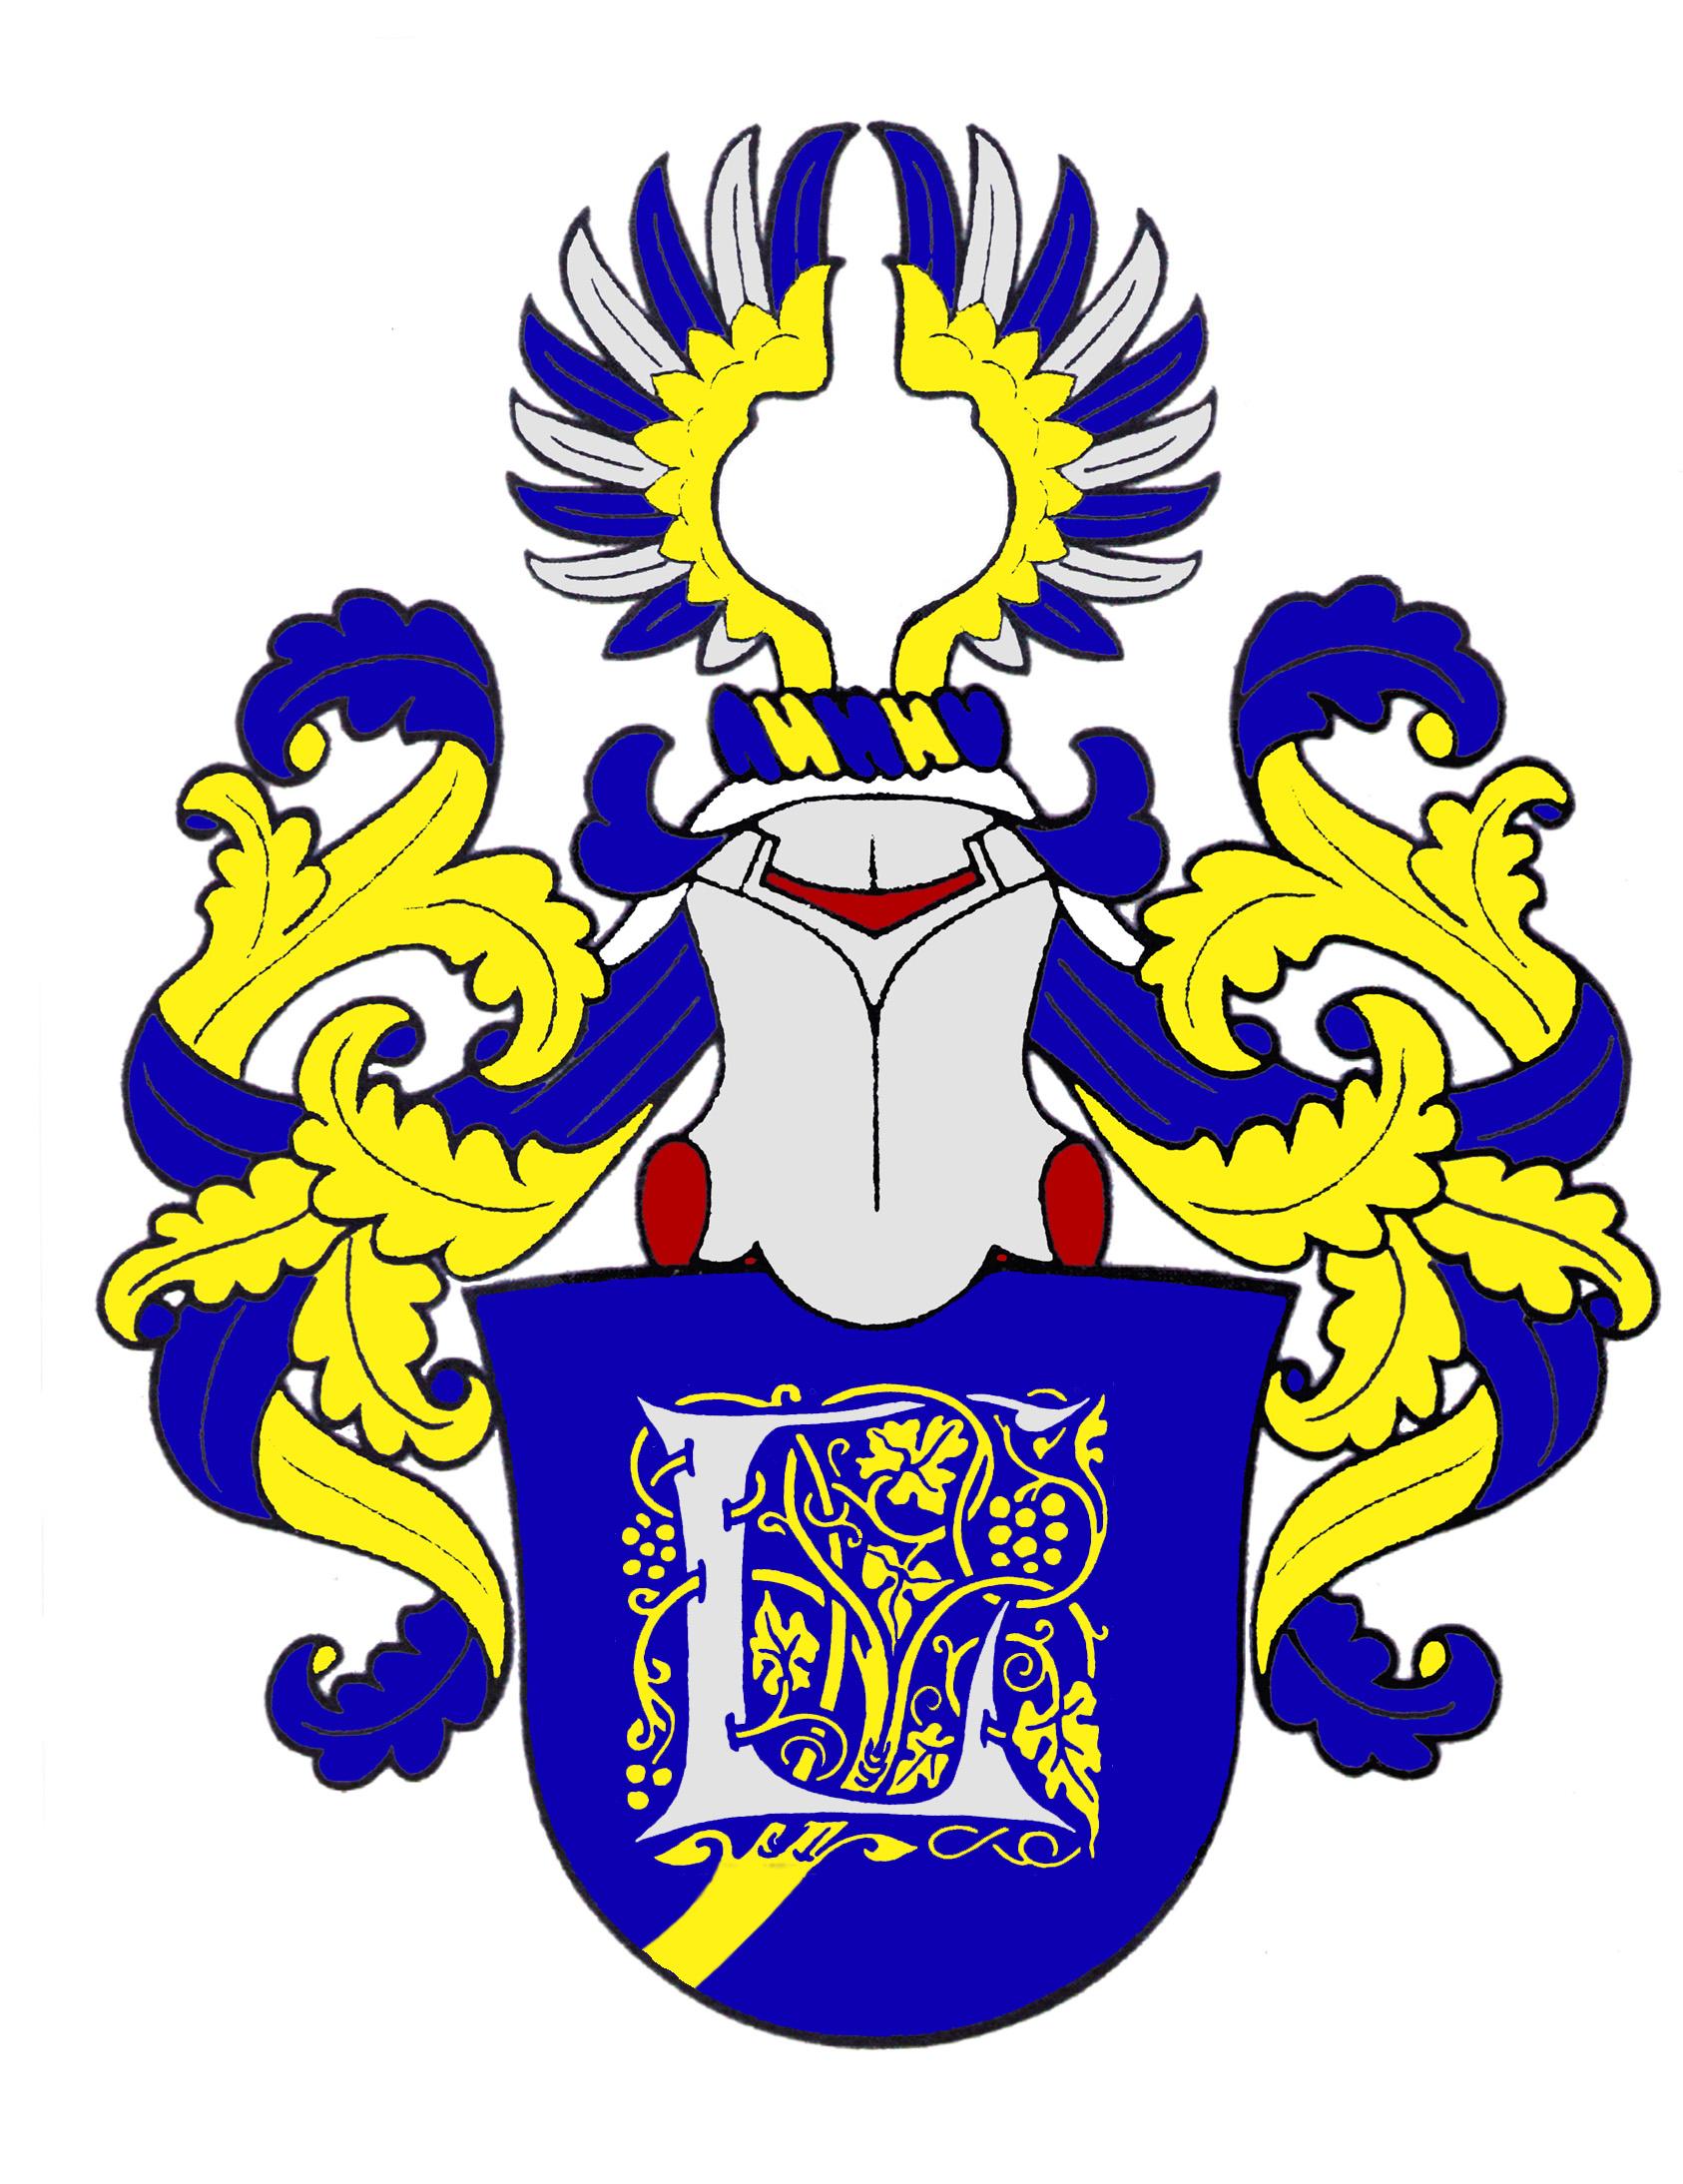 Legaunt Family Runescape Roleplay Wiki Fandom Powered By Wikia